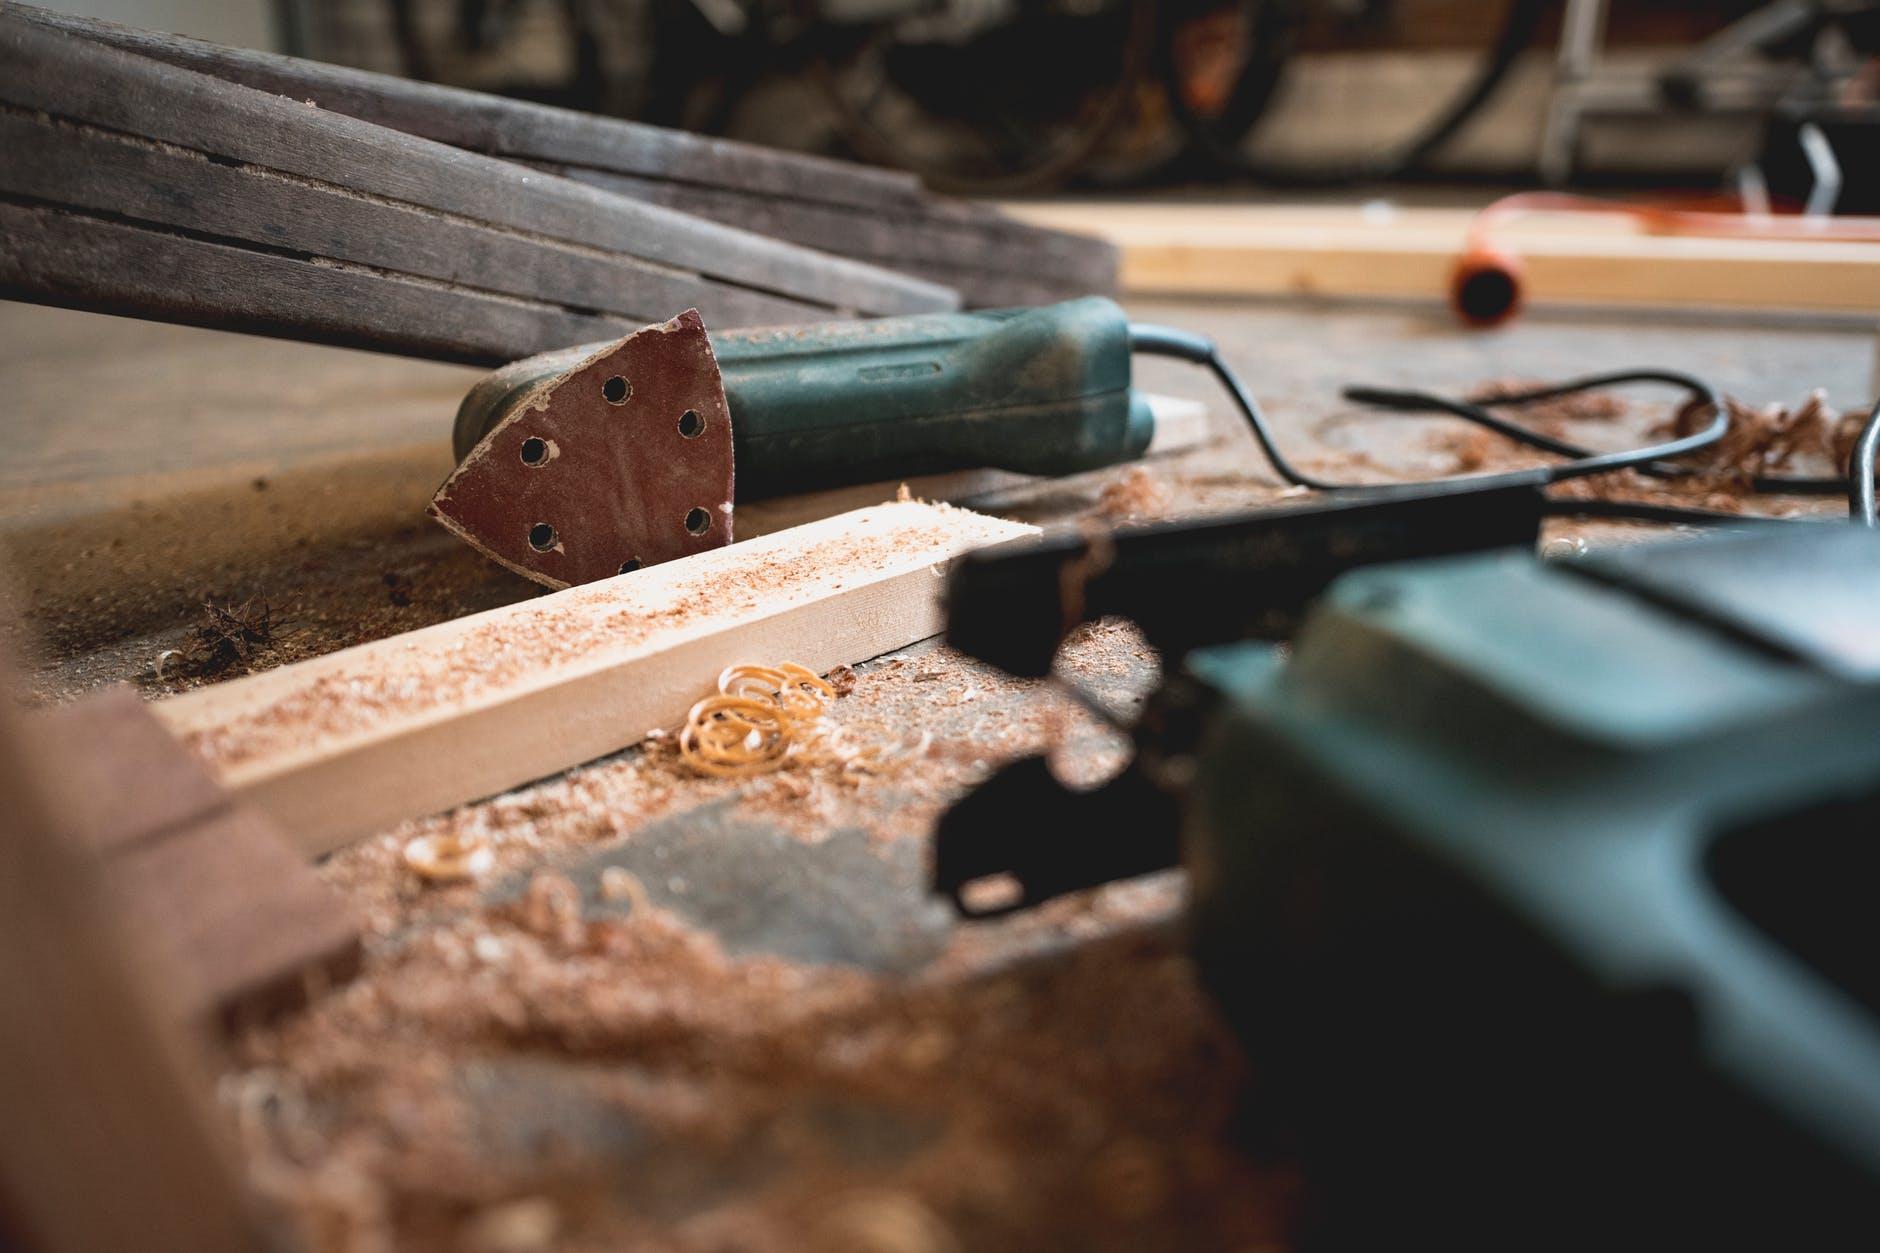 Manufacturing wooden door panels from lumber